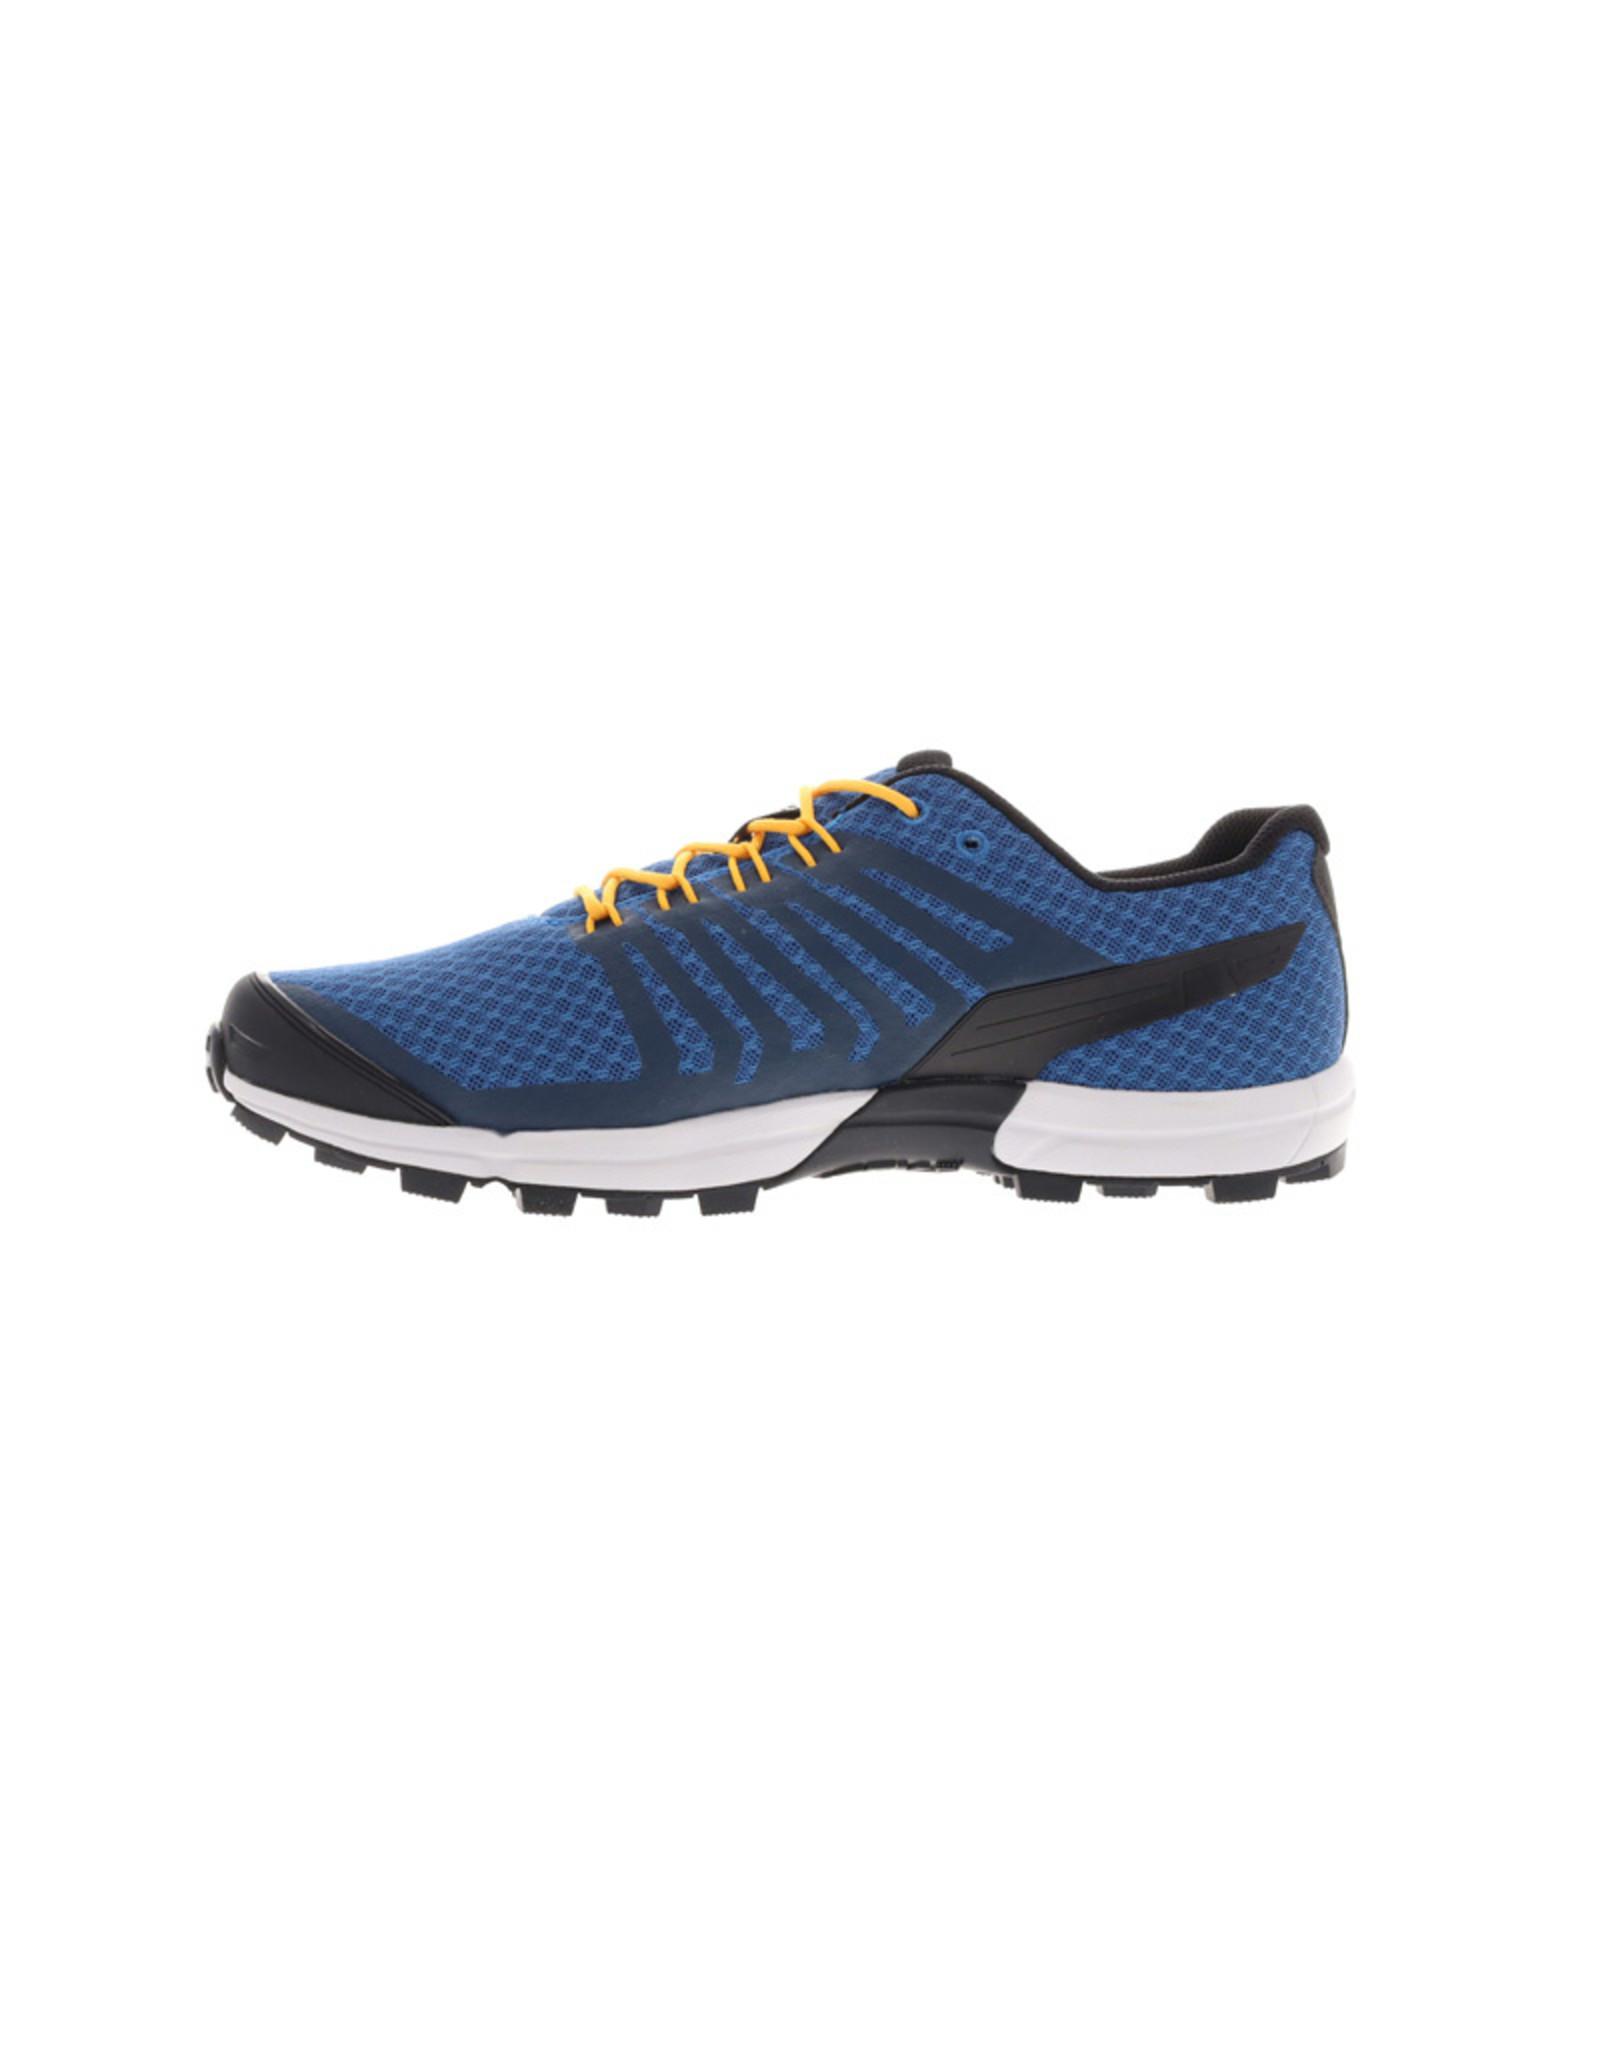 Inov-8 Roclite G 290 Chaussure Trailrun - Bleu/Jaune